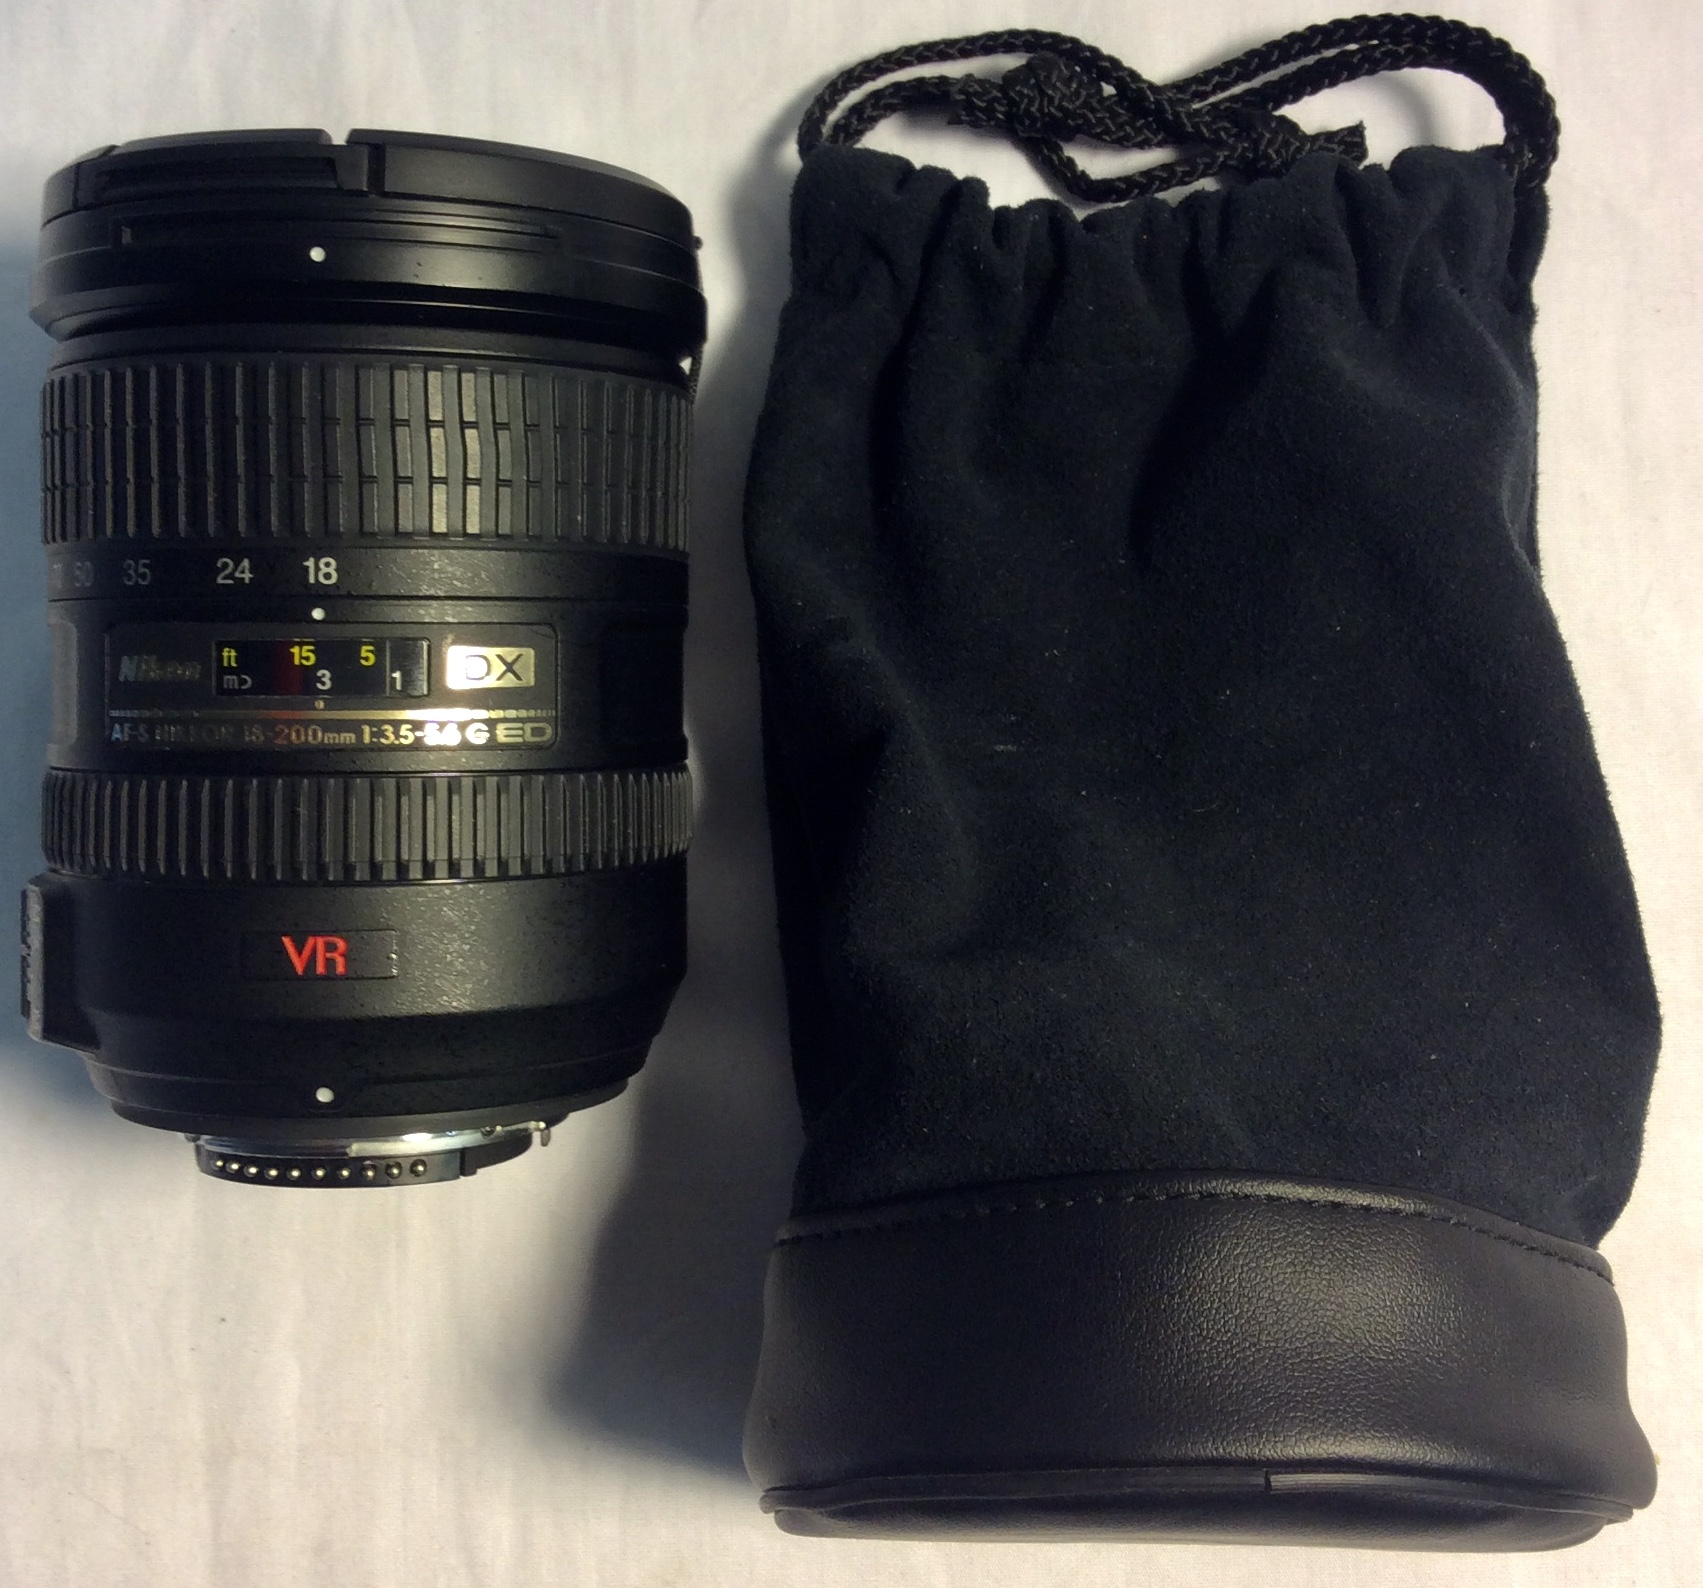 Nikon Nikon VR lense with lense cap